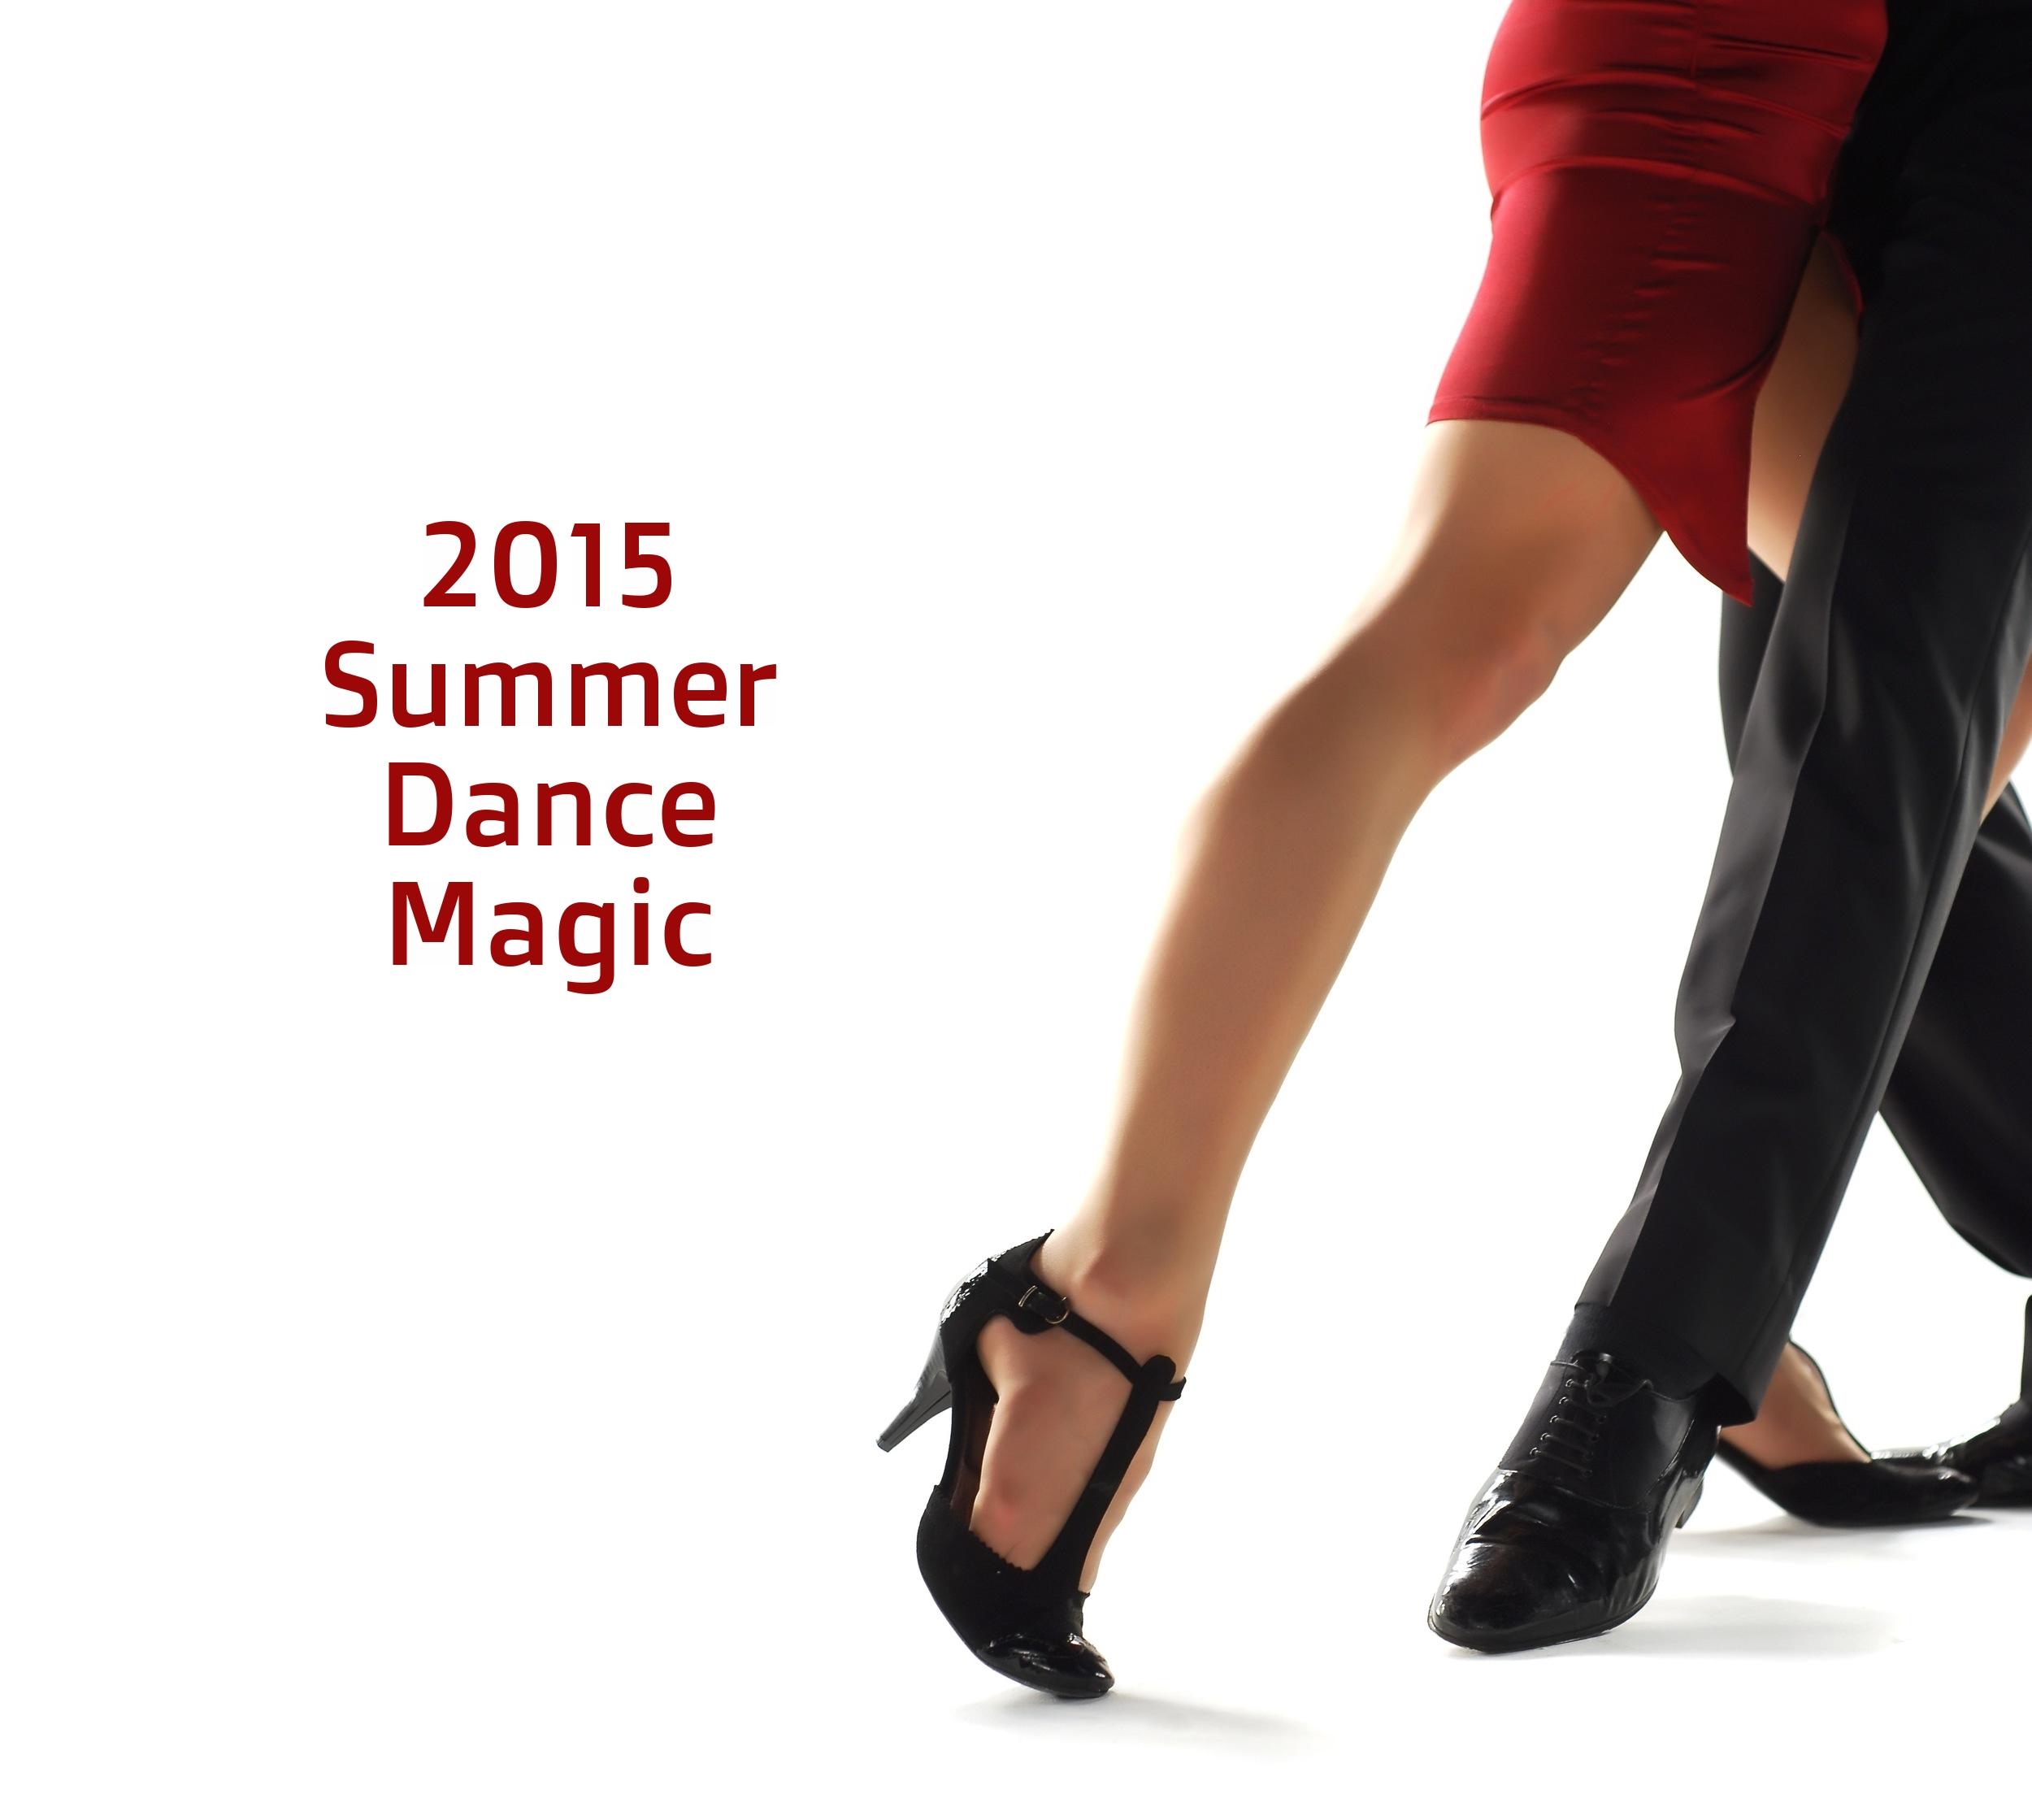 2015 Summer Dance Magic at Quick Quick Slow Ballroom - Sunday, July 26, 4-8 p.m.